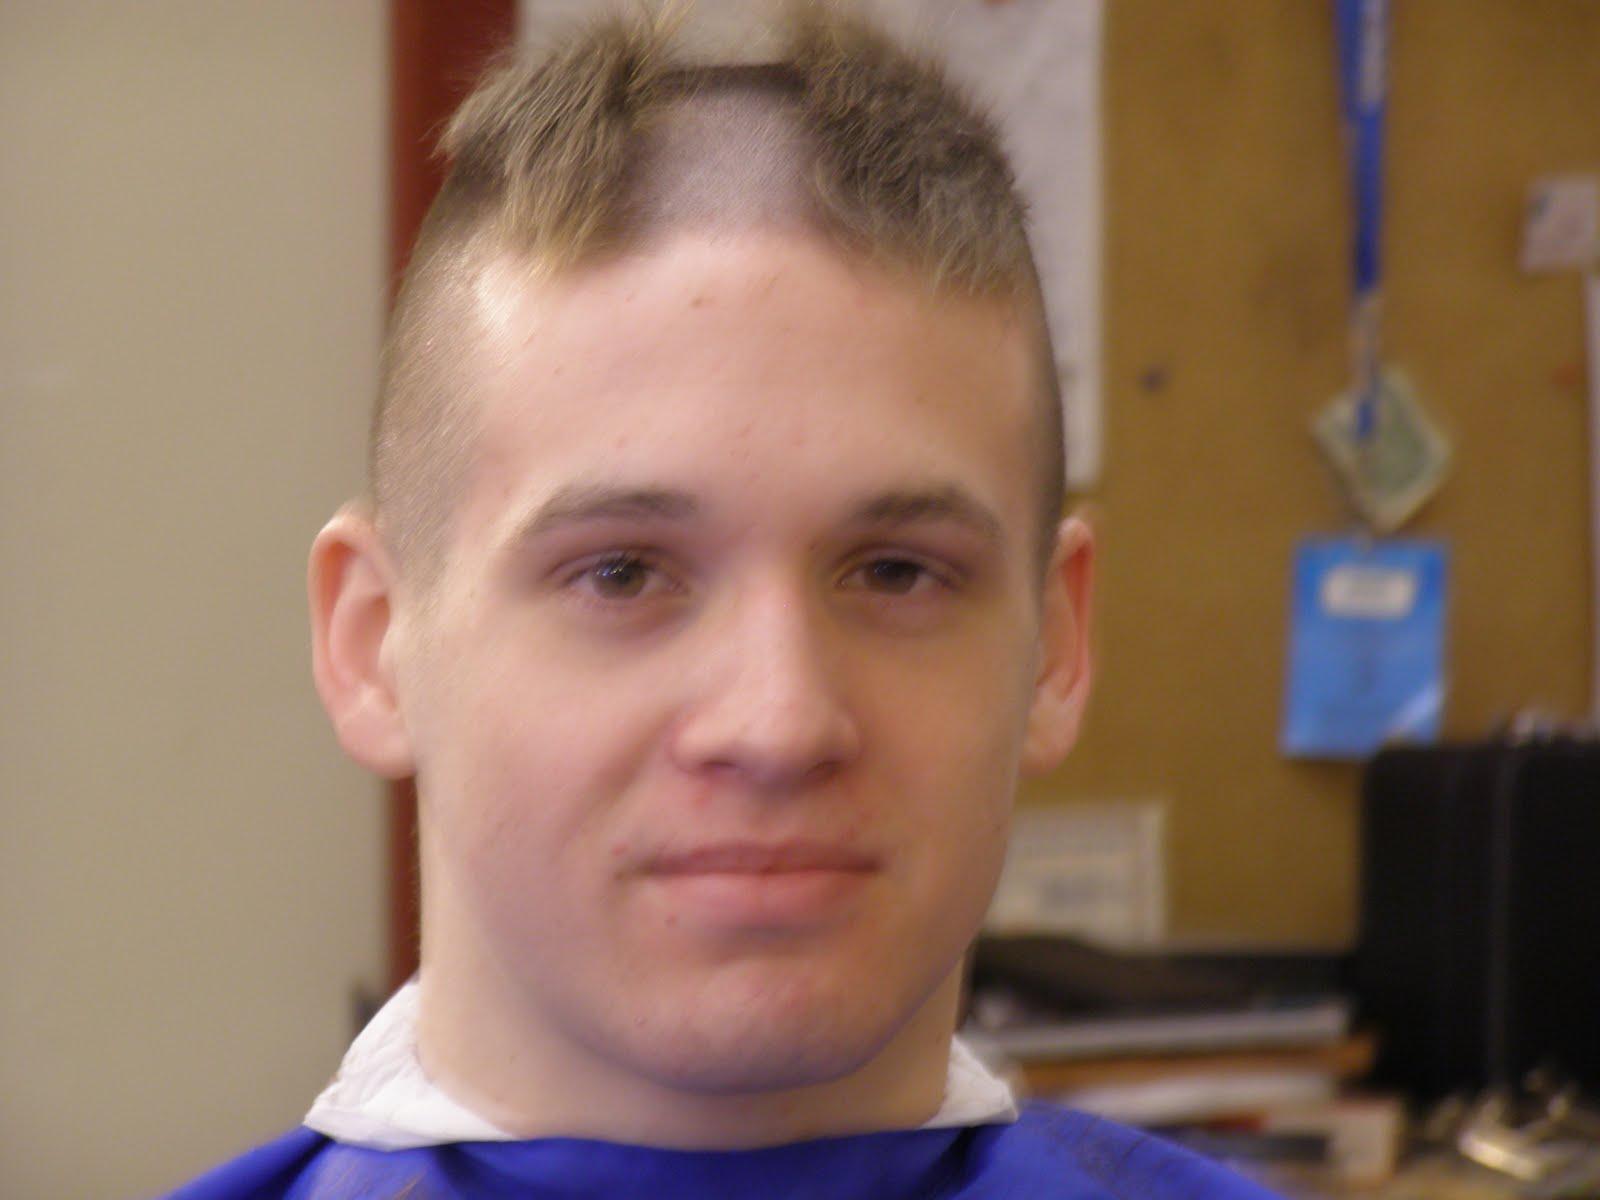 Bad Shaved Head 100